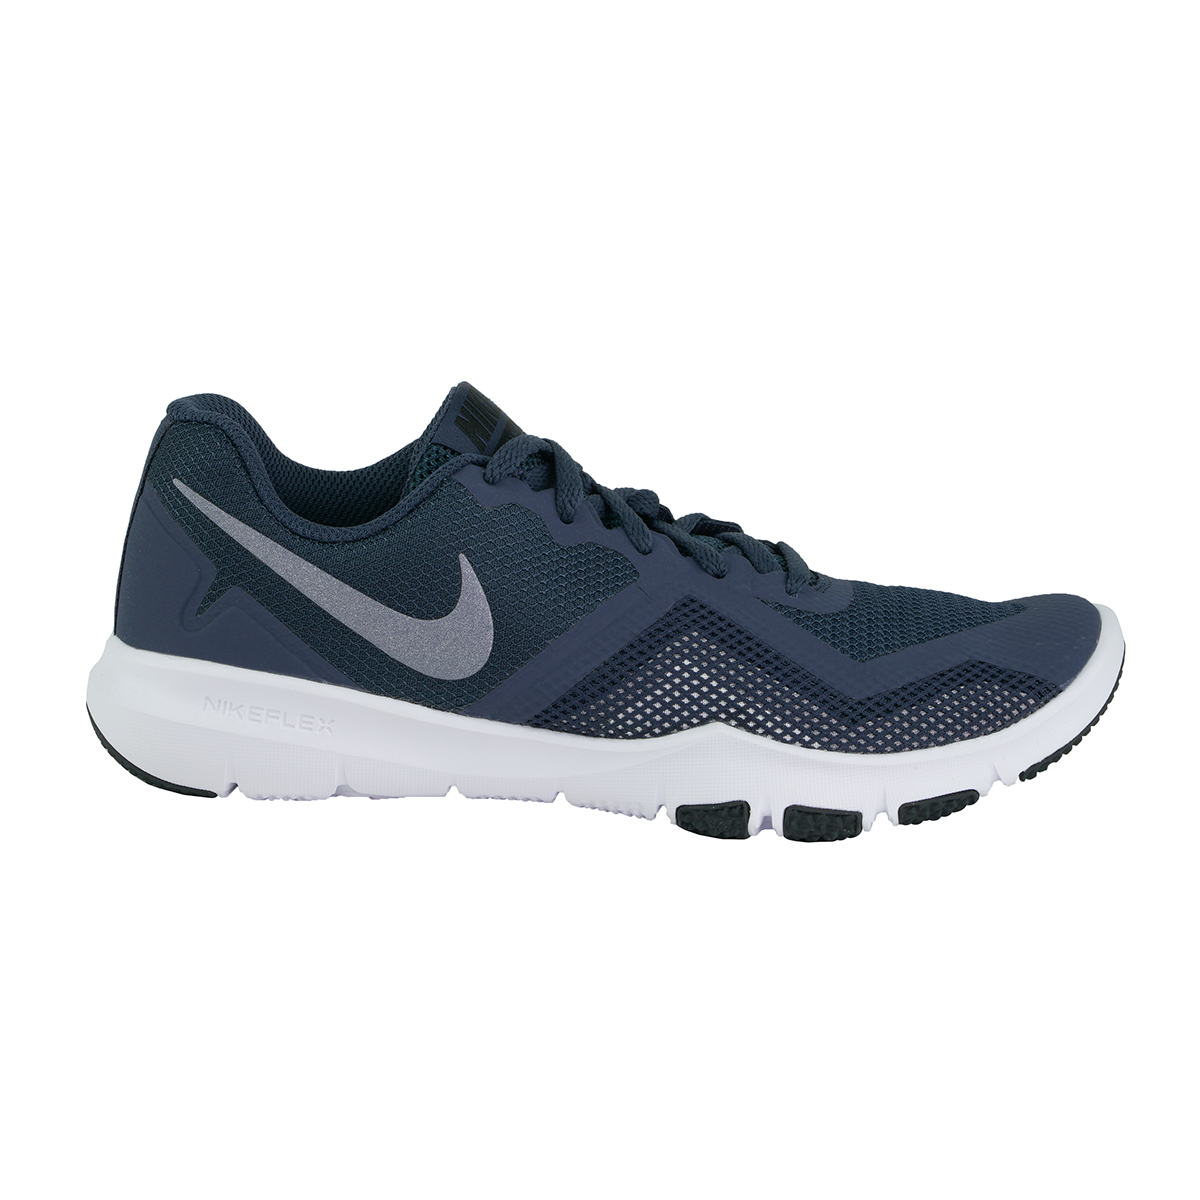 ecd6fe59a4caa8 Details about Nike Men s Flex Control II Shoes